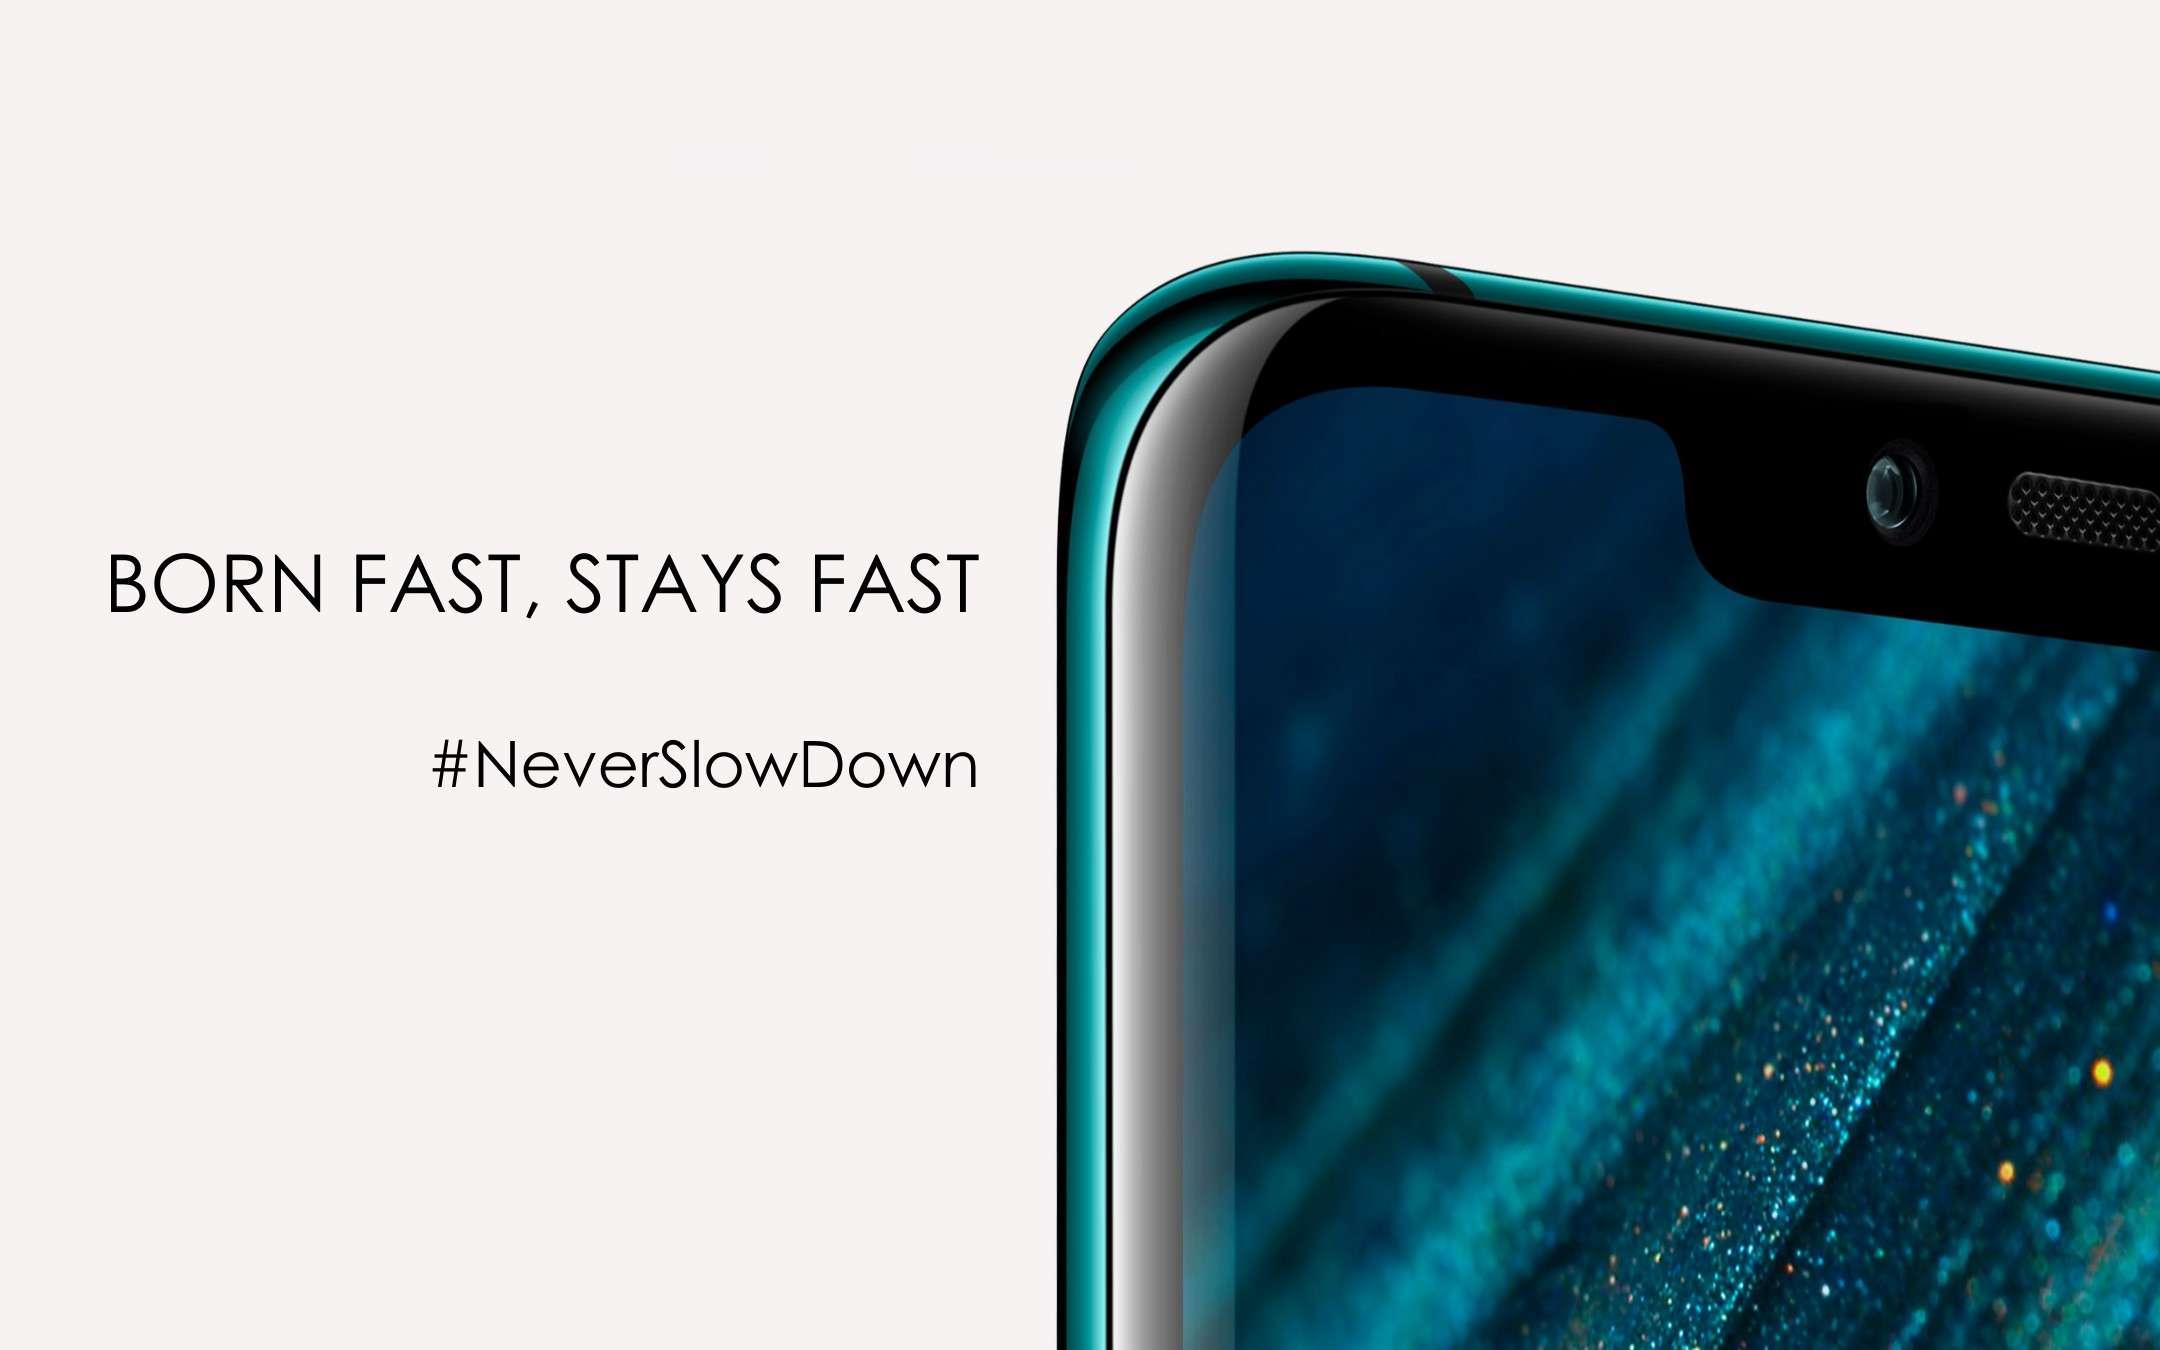 Never slow down: Huawei sfida Apple e Samsung